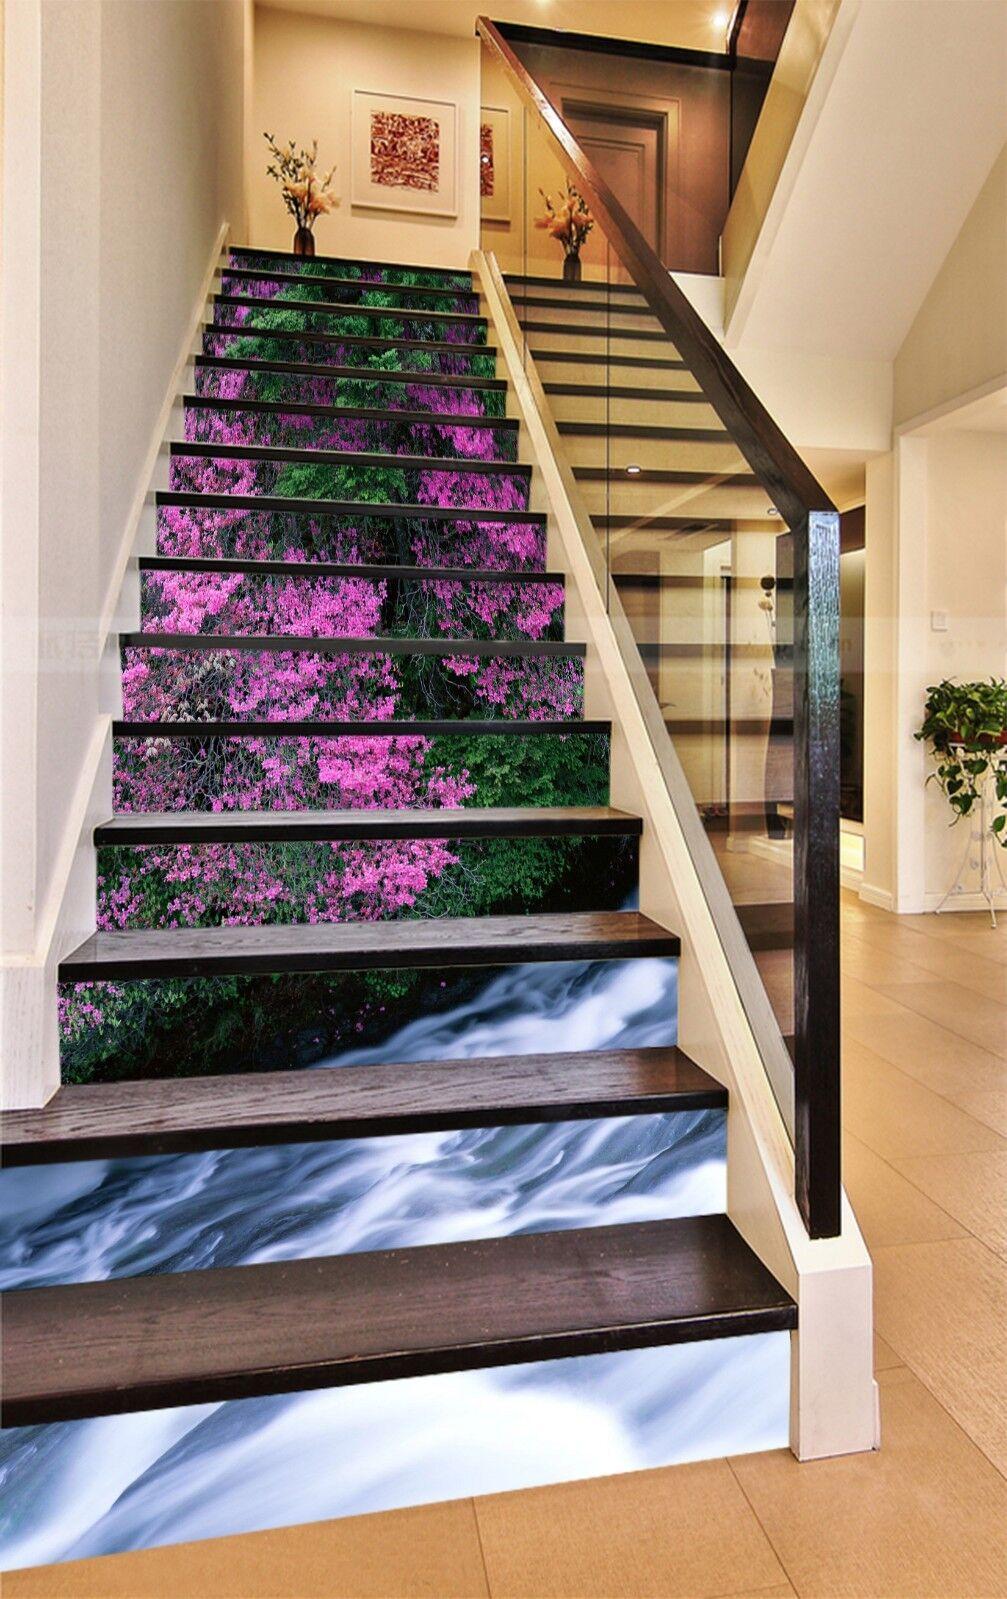 3D Flower creek 5 Stair Risers Decoration Photo Mural Vinyl Decal Wallpaper UK